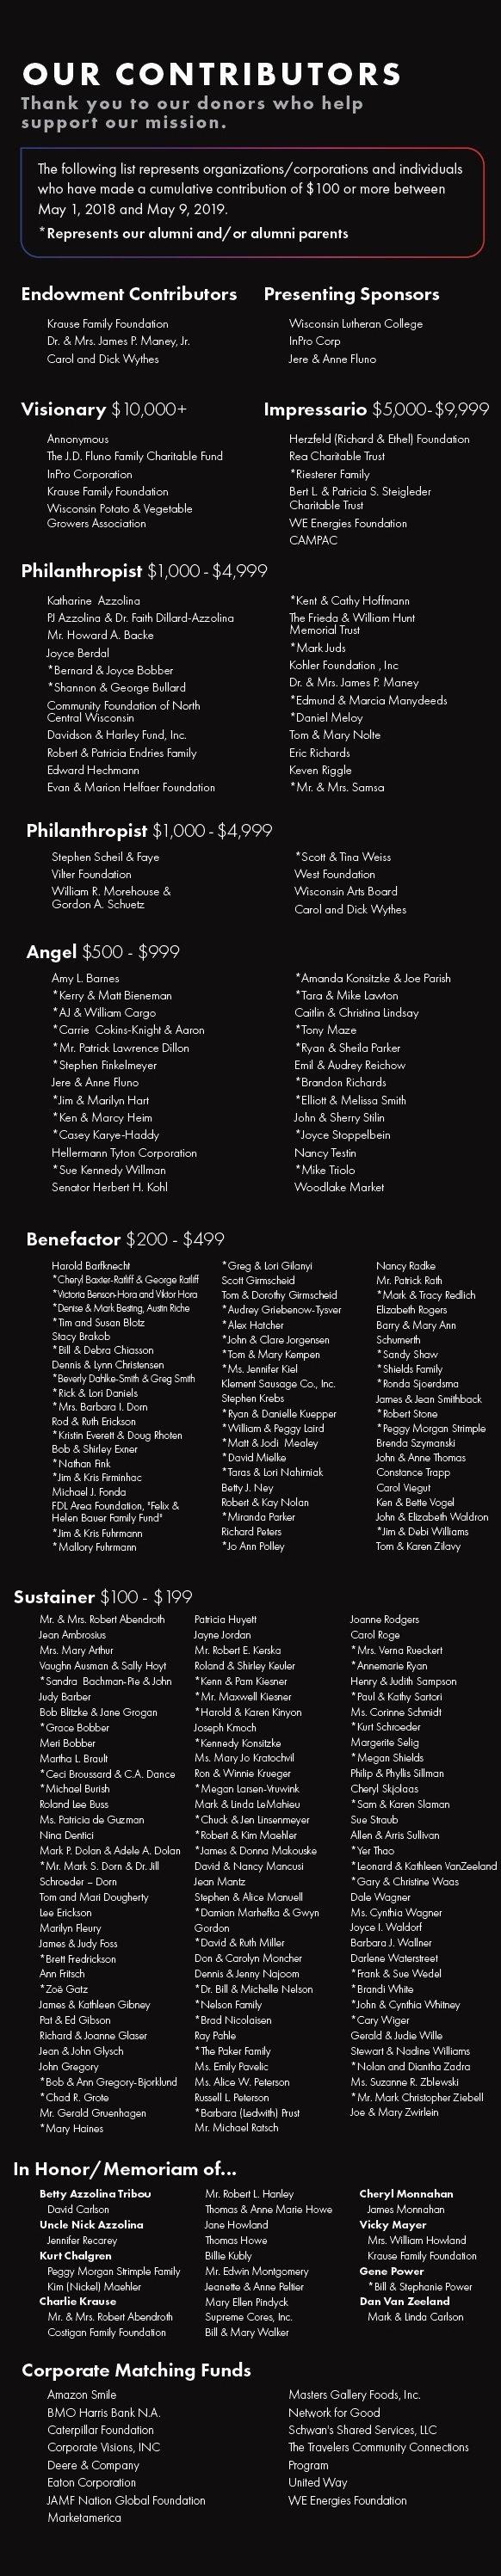 2019Contributors-2.jpg